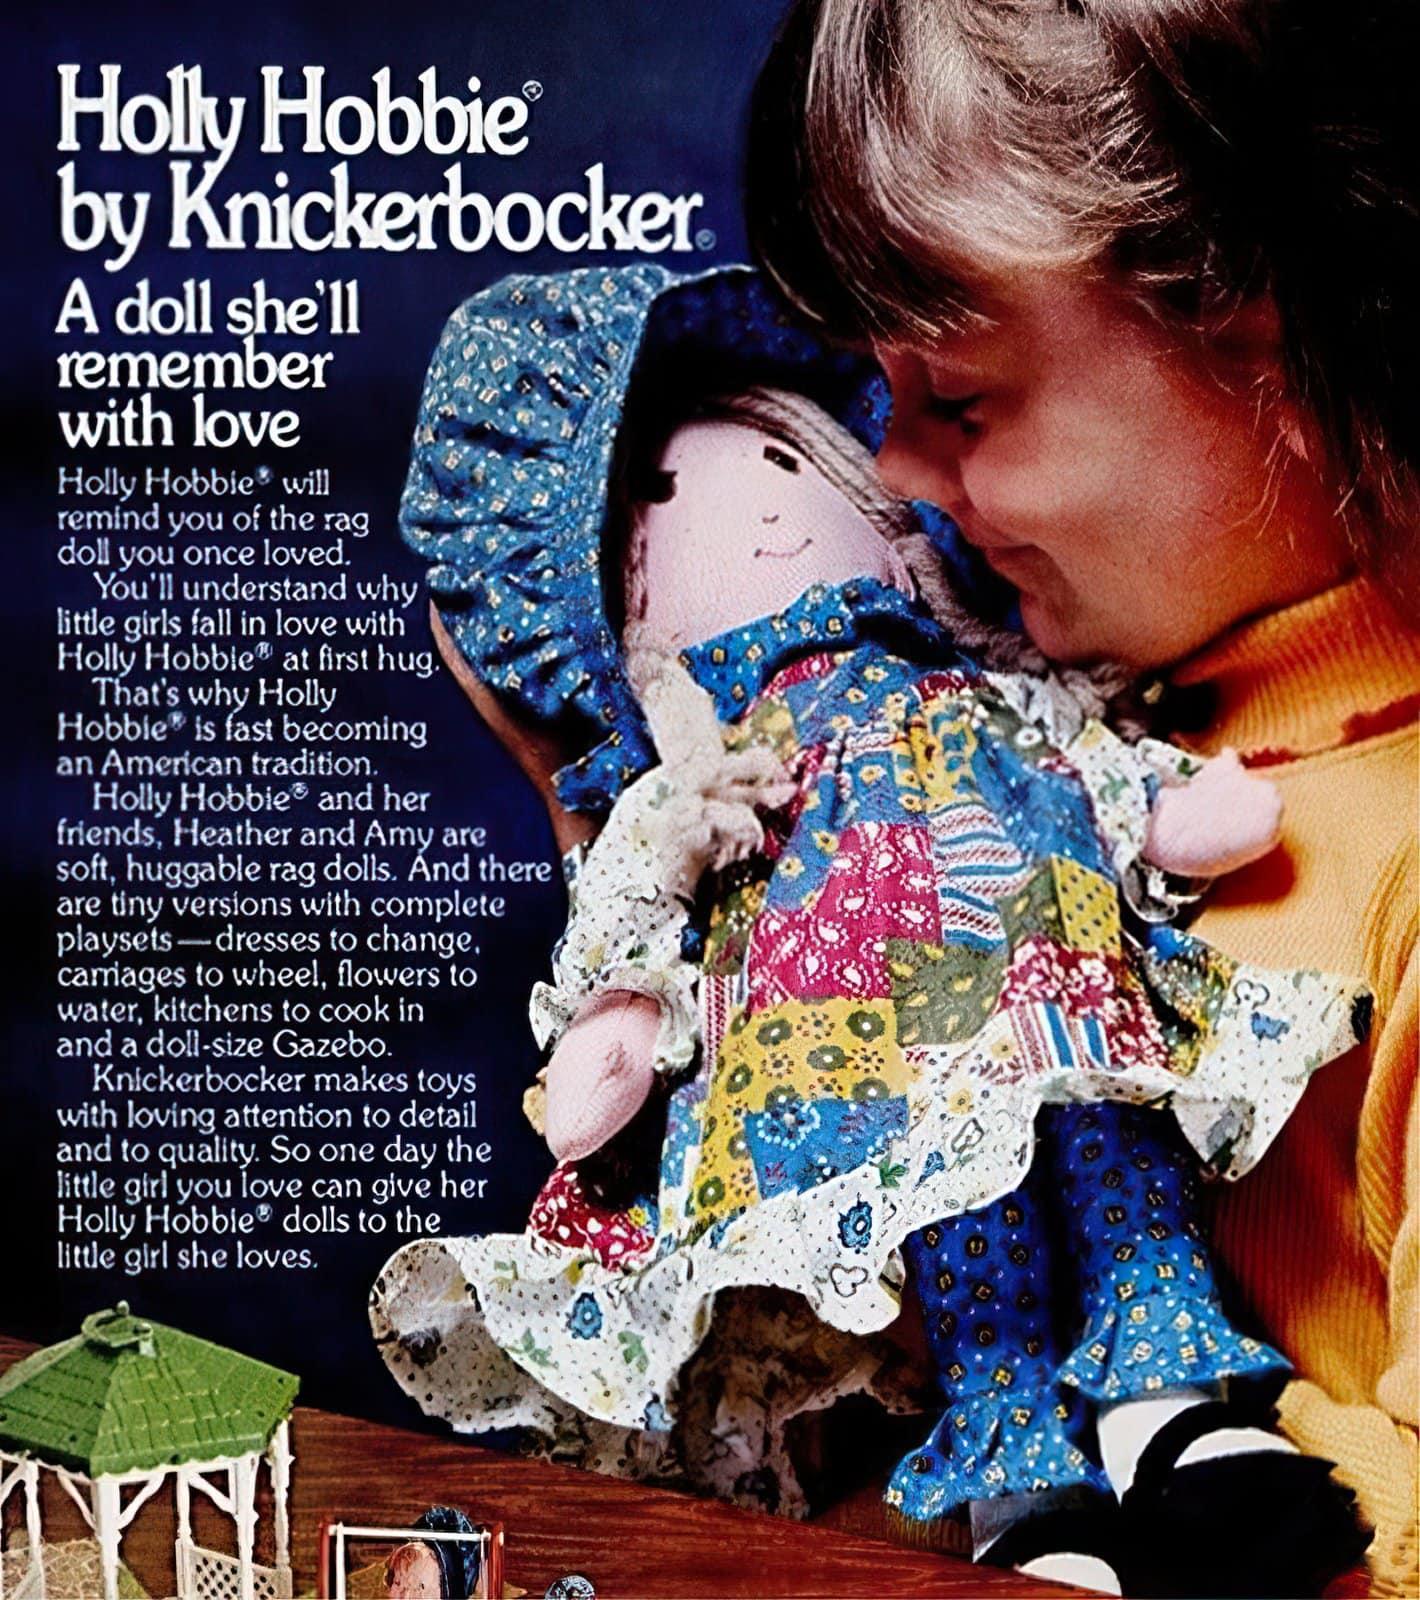 Vintage Holly Hobbie dolls (1976)